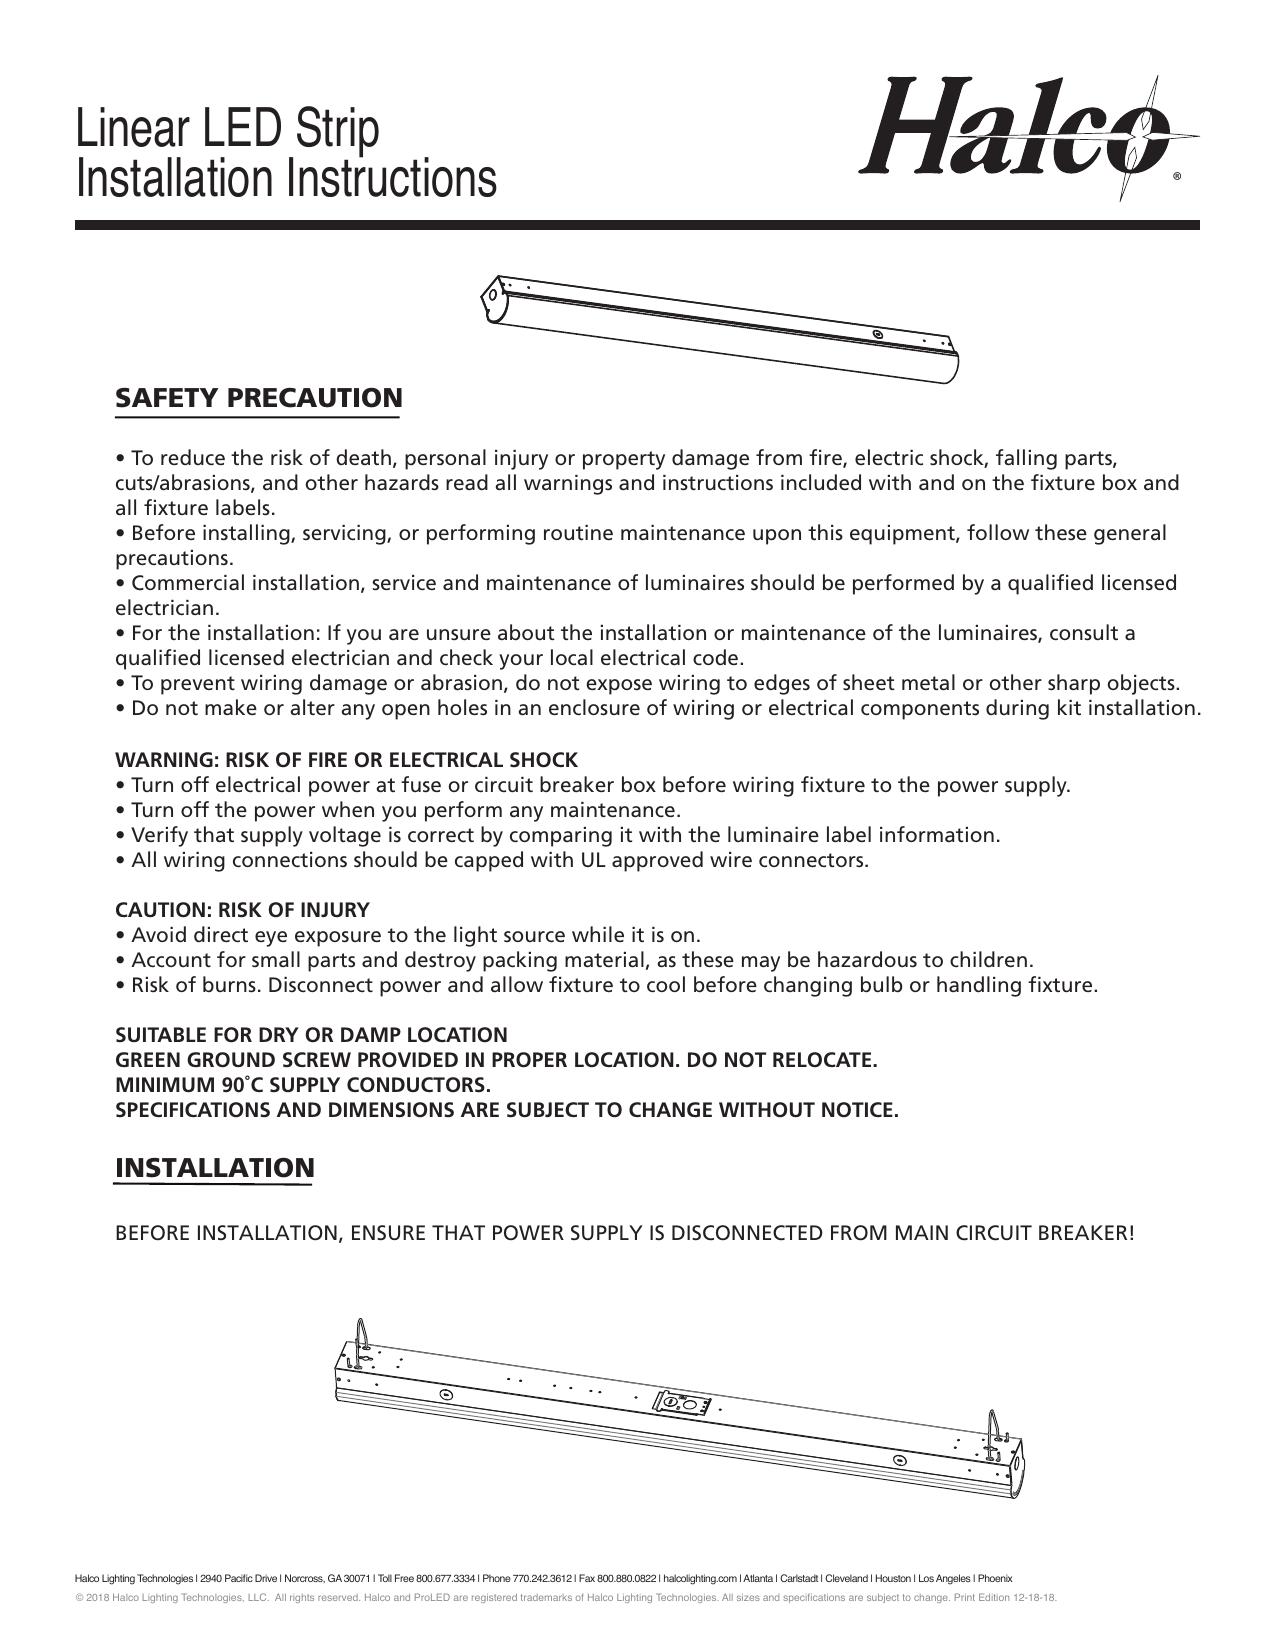 Halco Lighting Technologies Ls4 36u50 10241 Installation Guide Manualzz